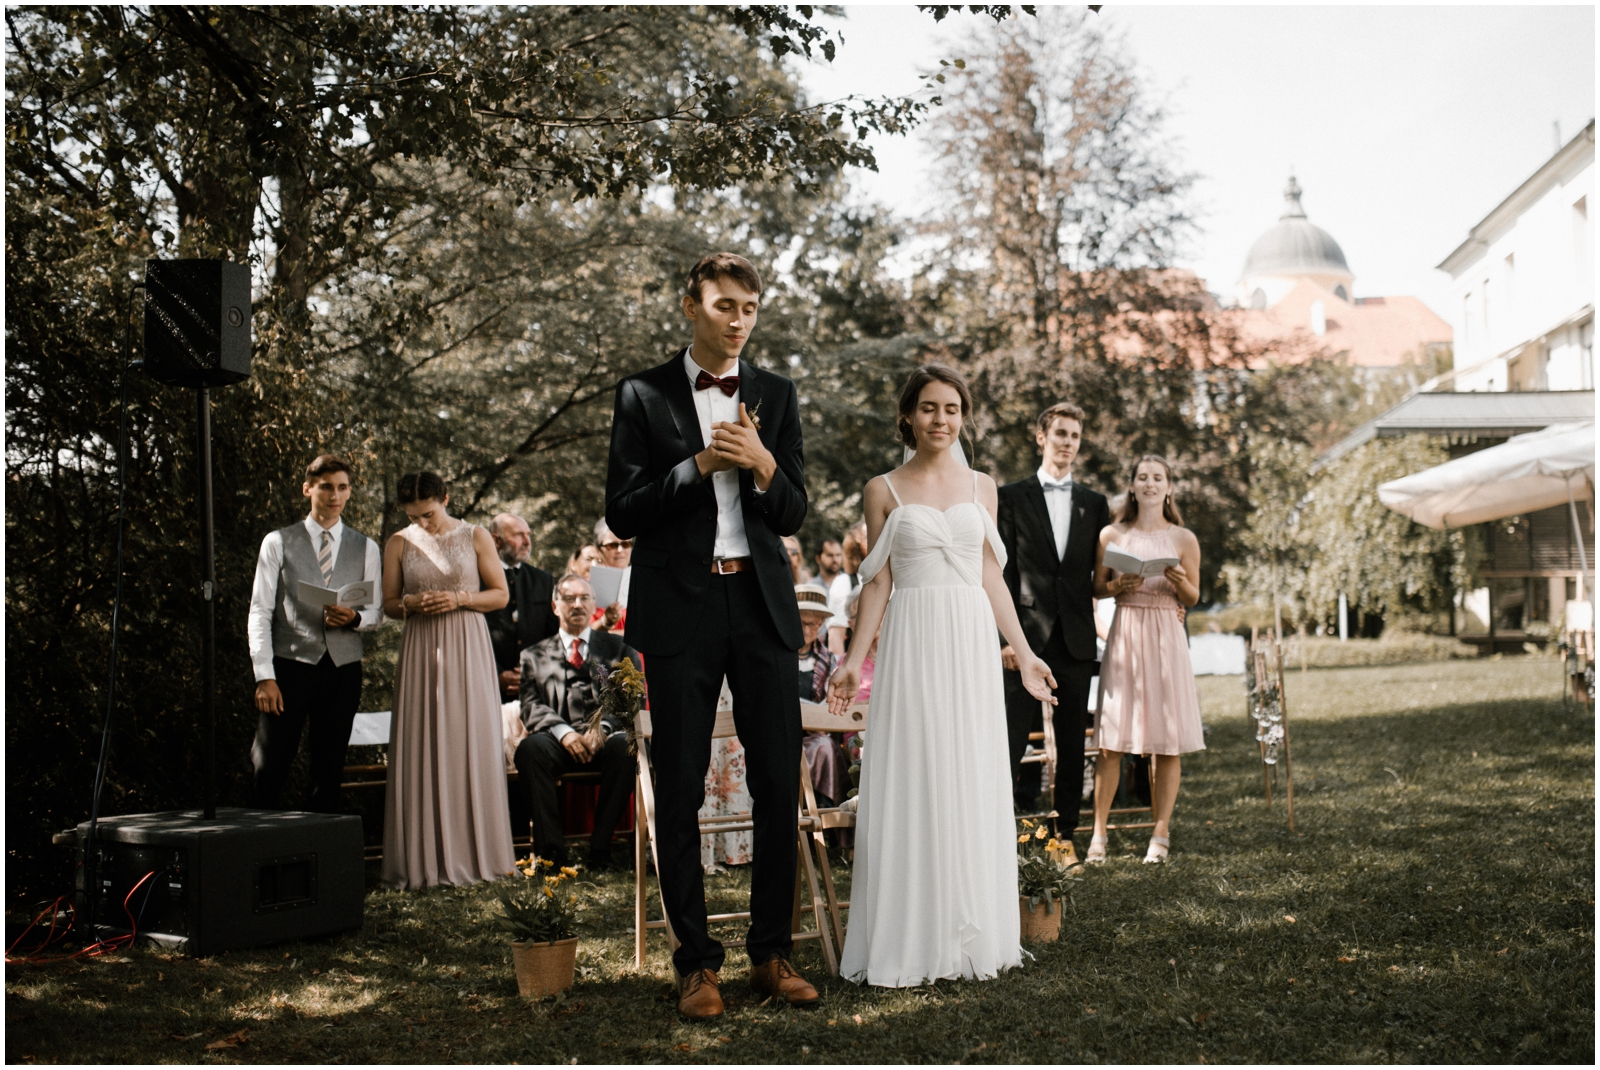 mirjam_thomas_wedding-344.jpg